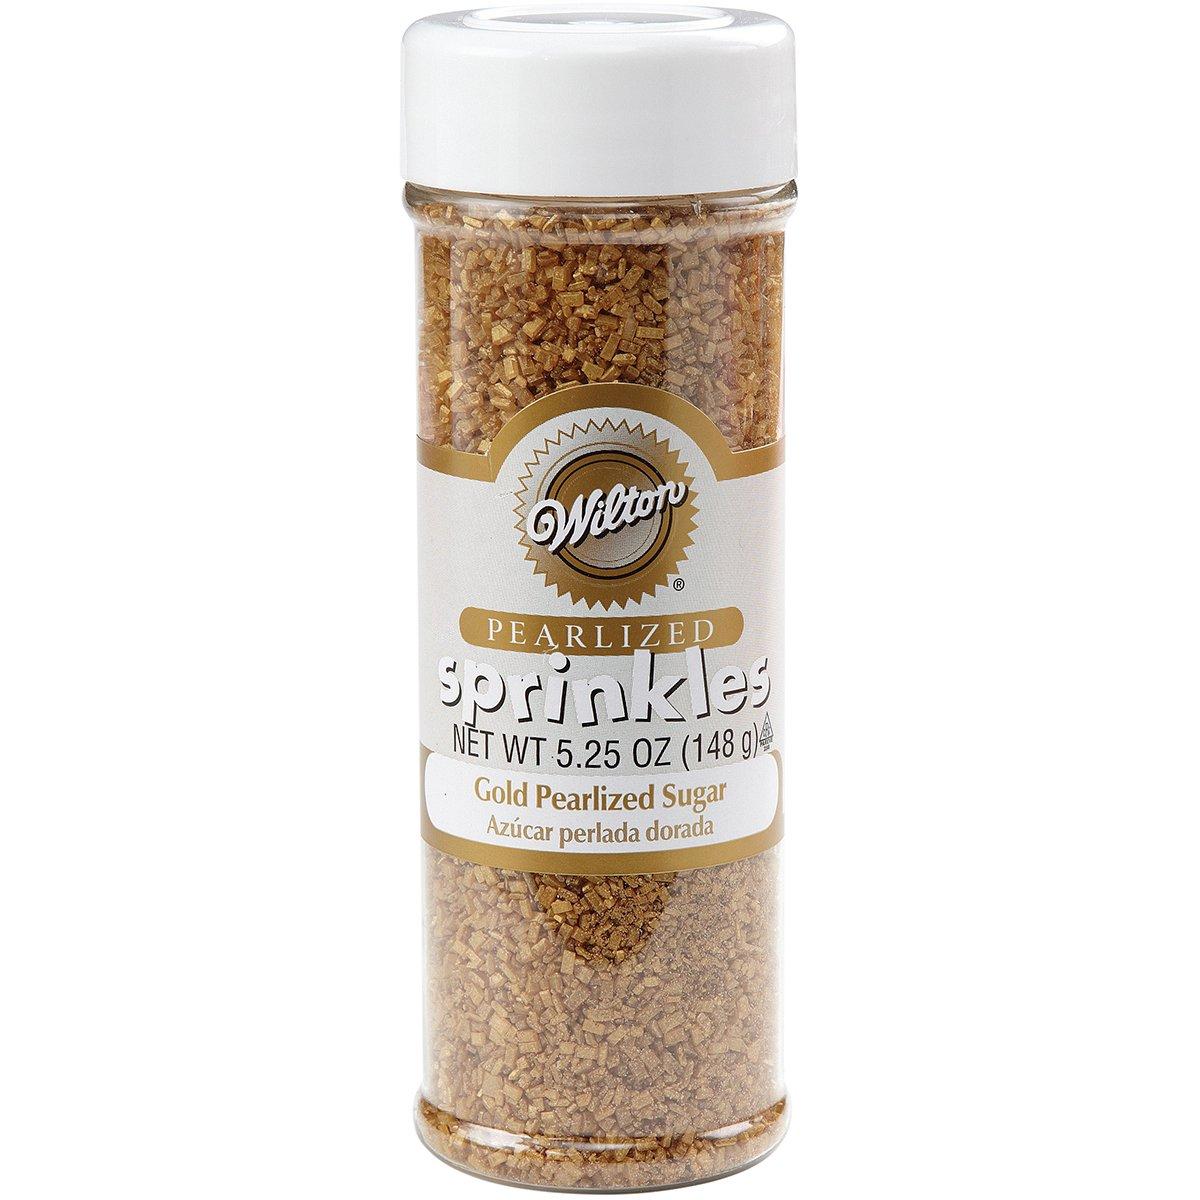 Wilton Gold Pearlized Sugar Sprinkles, 5.25 oz.